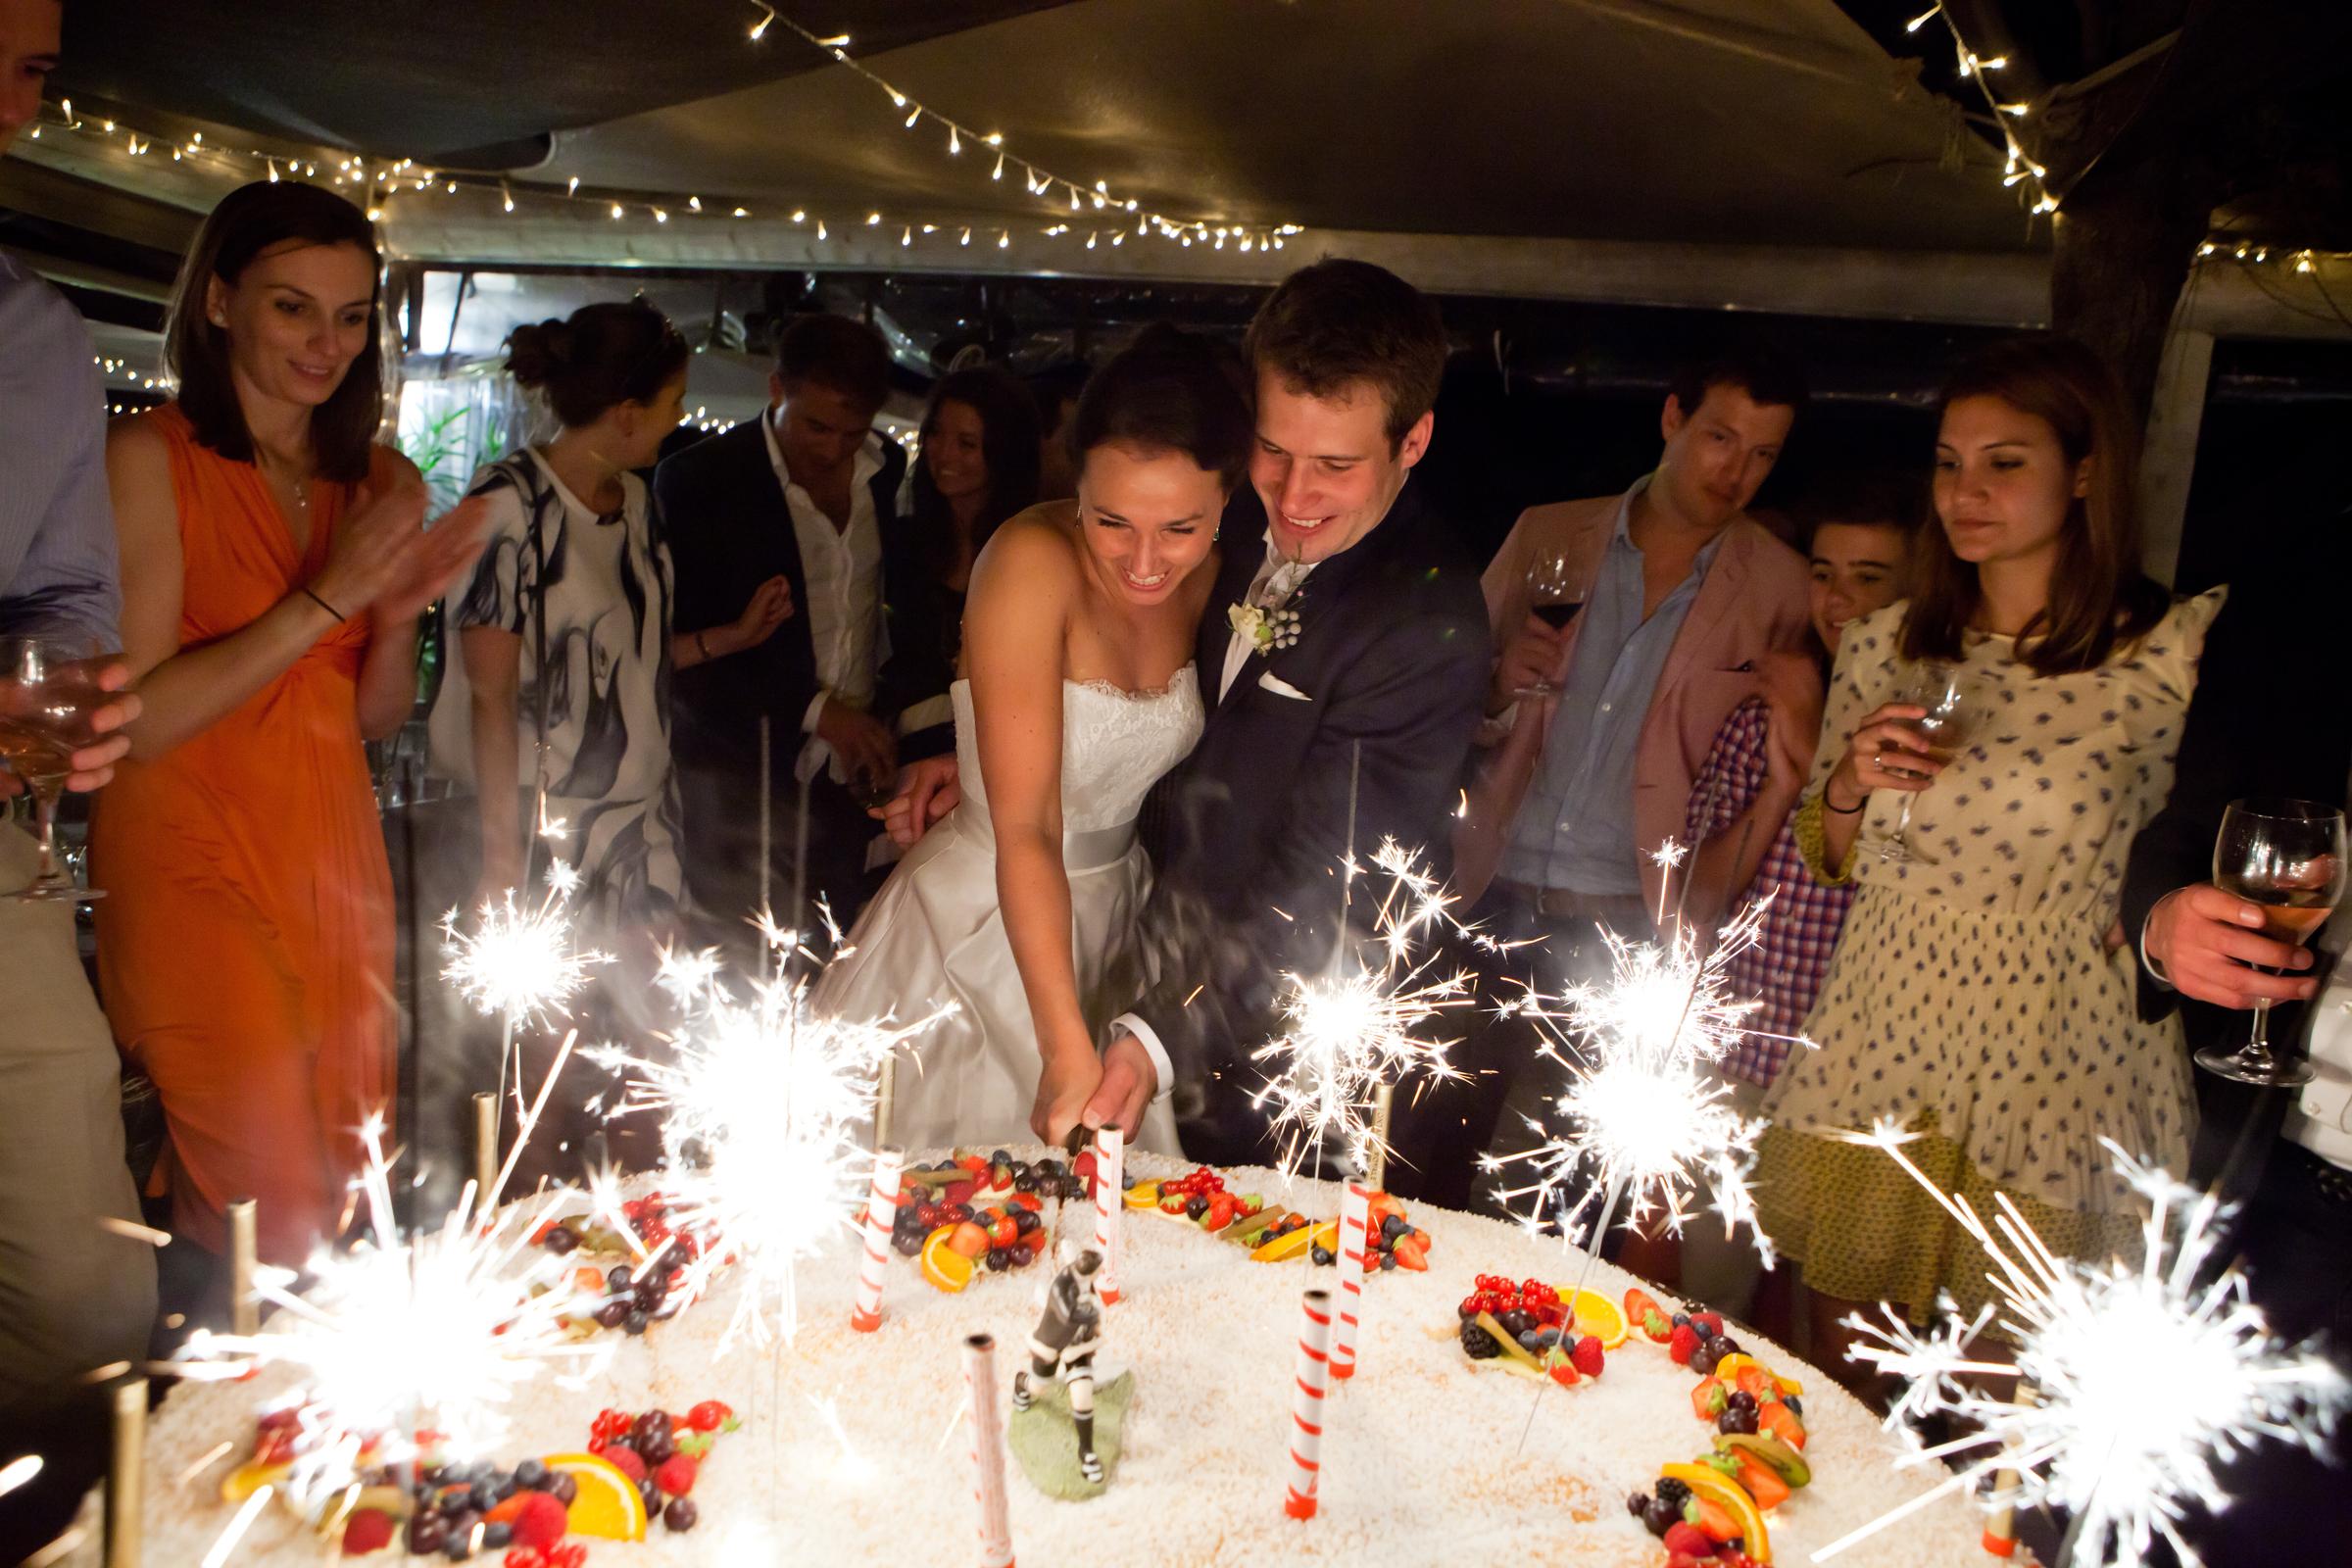 Wedding Cake, Tarte Tropezienne